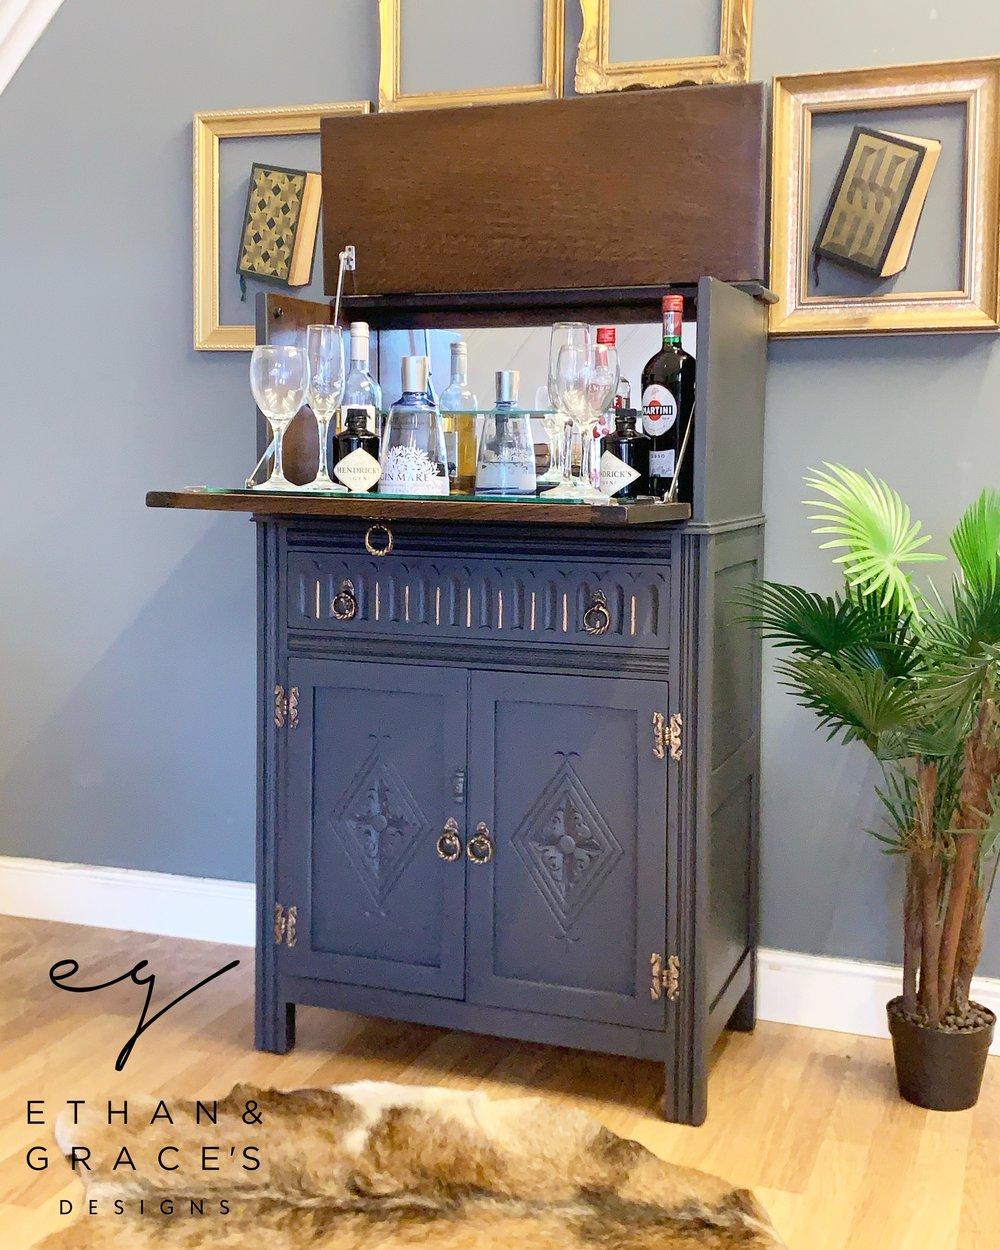 Image of Solid oak drinks cabinet in dark grey & gold.